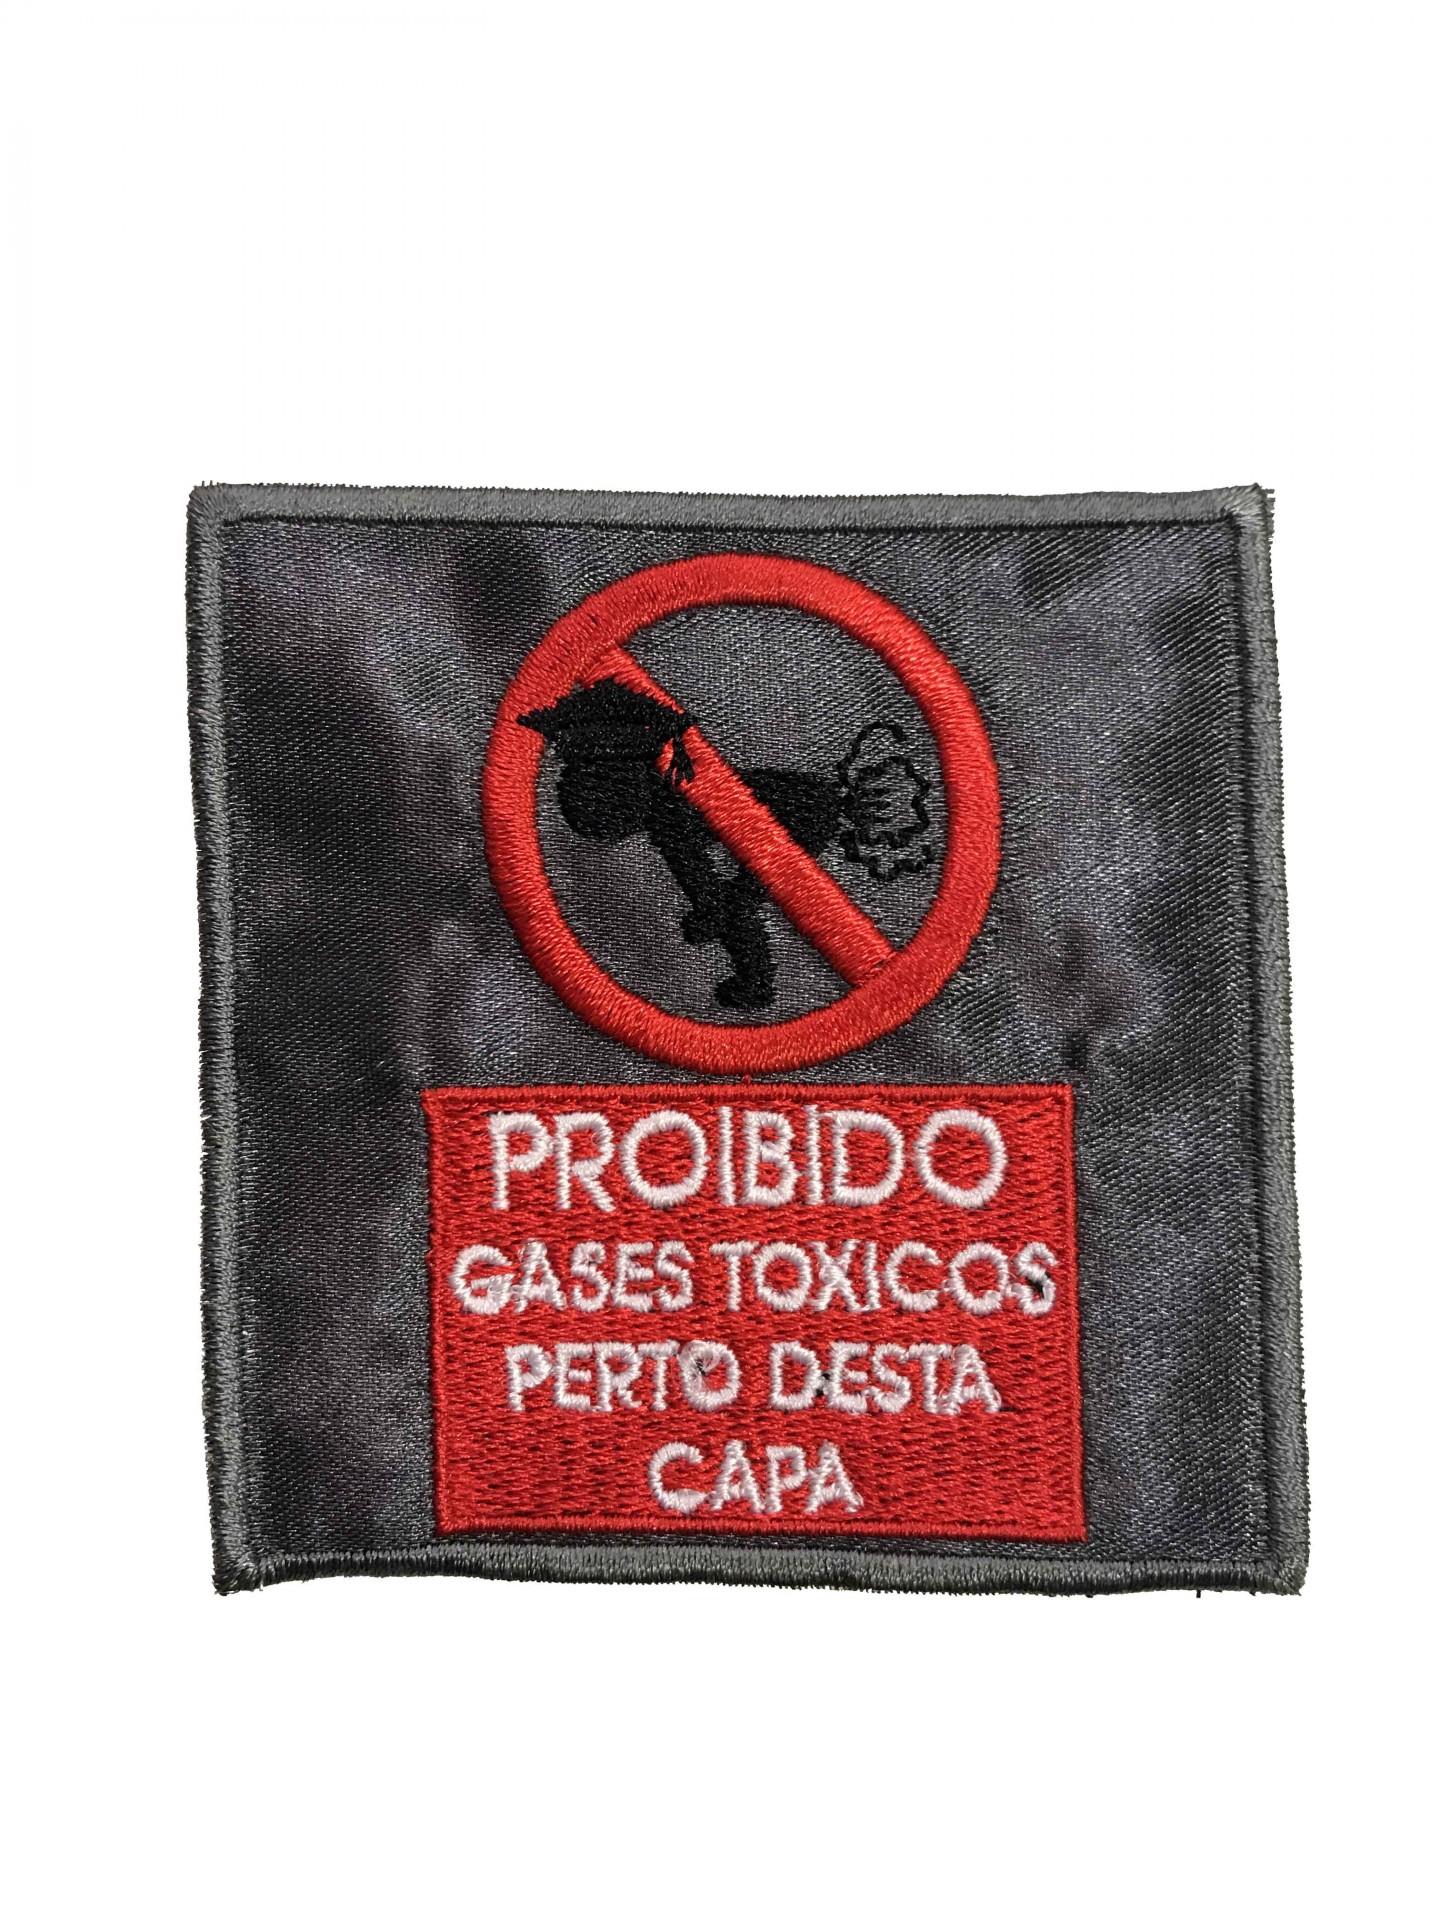 Emblema Gases Tóxicos